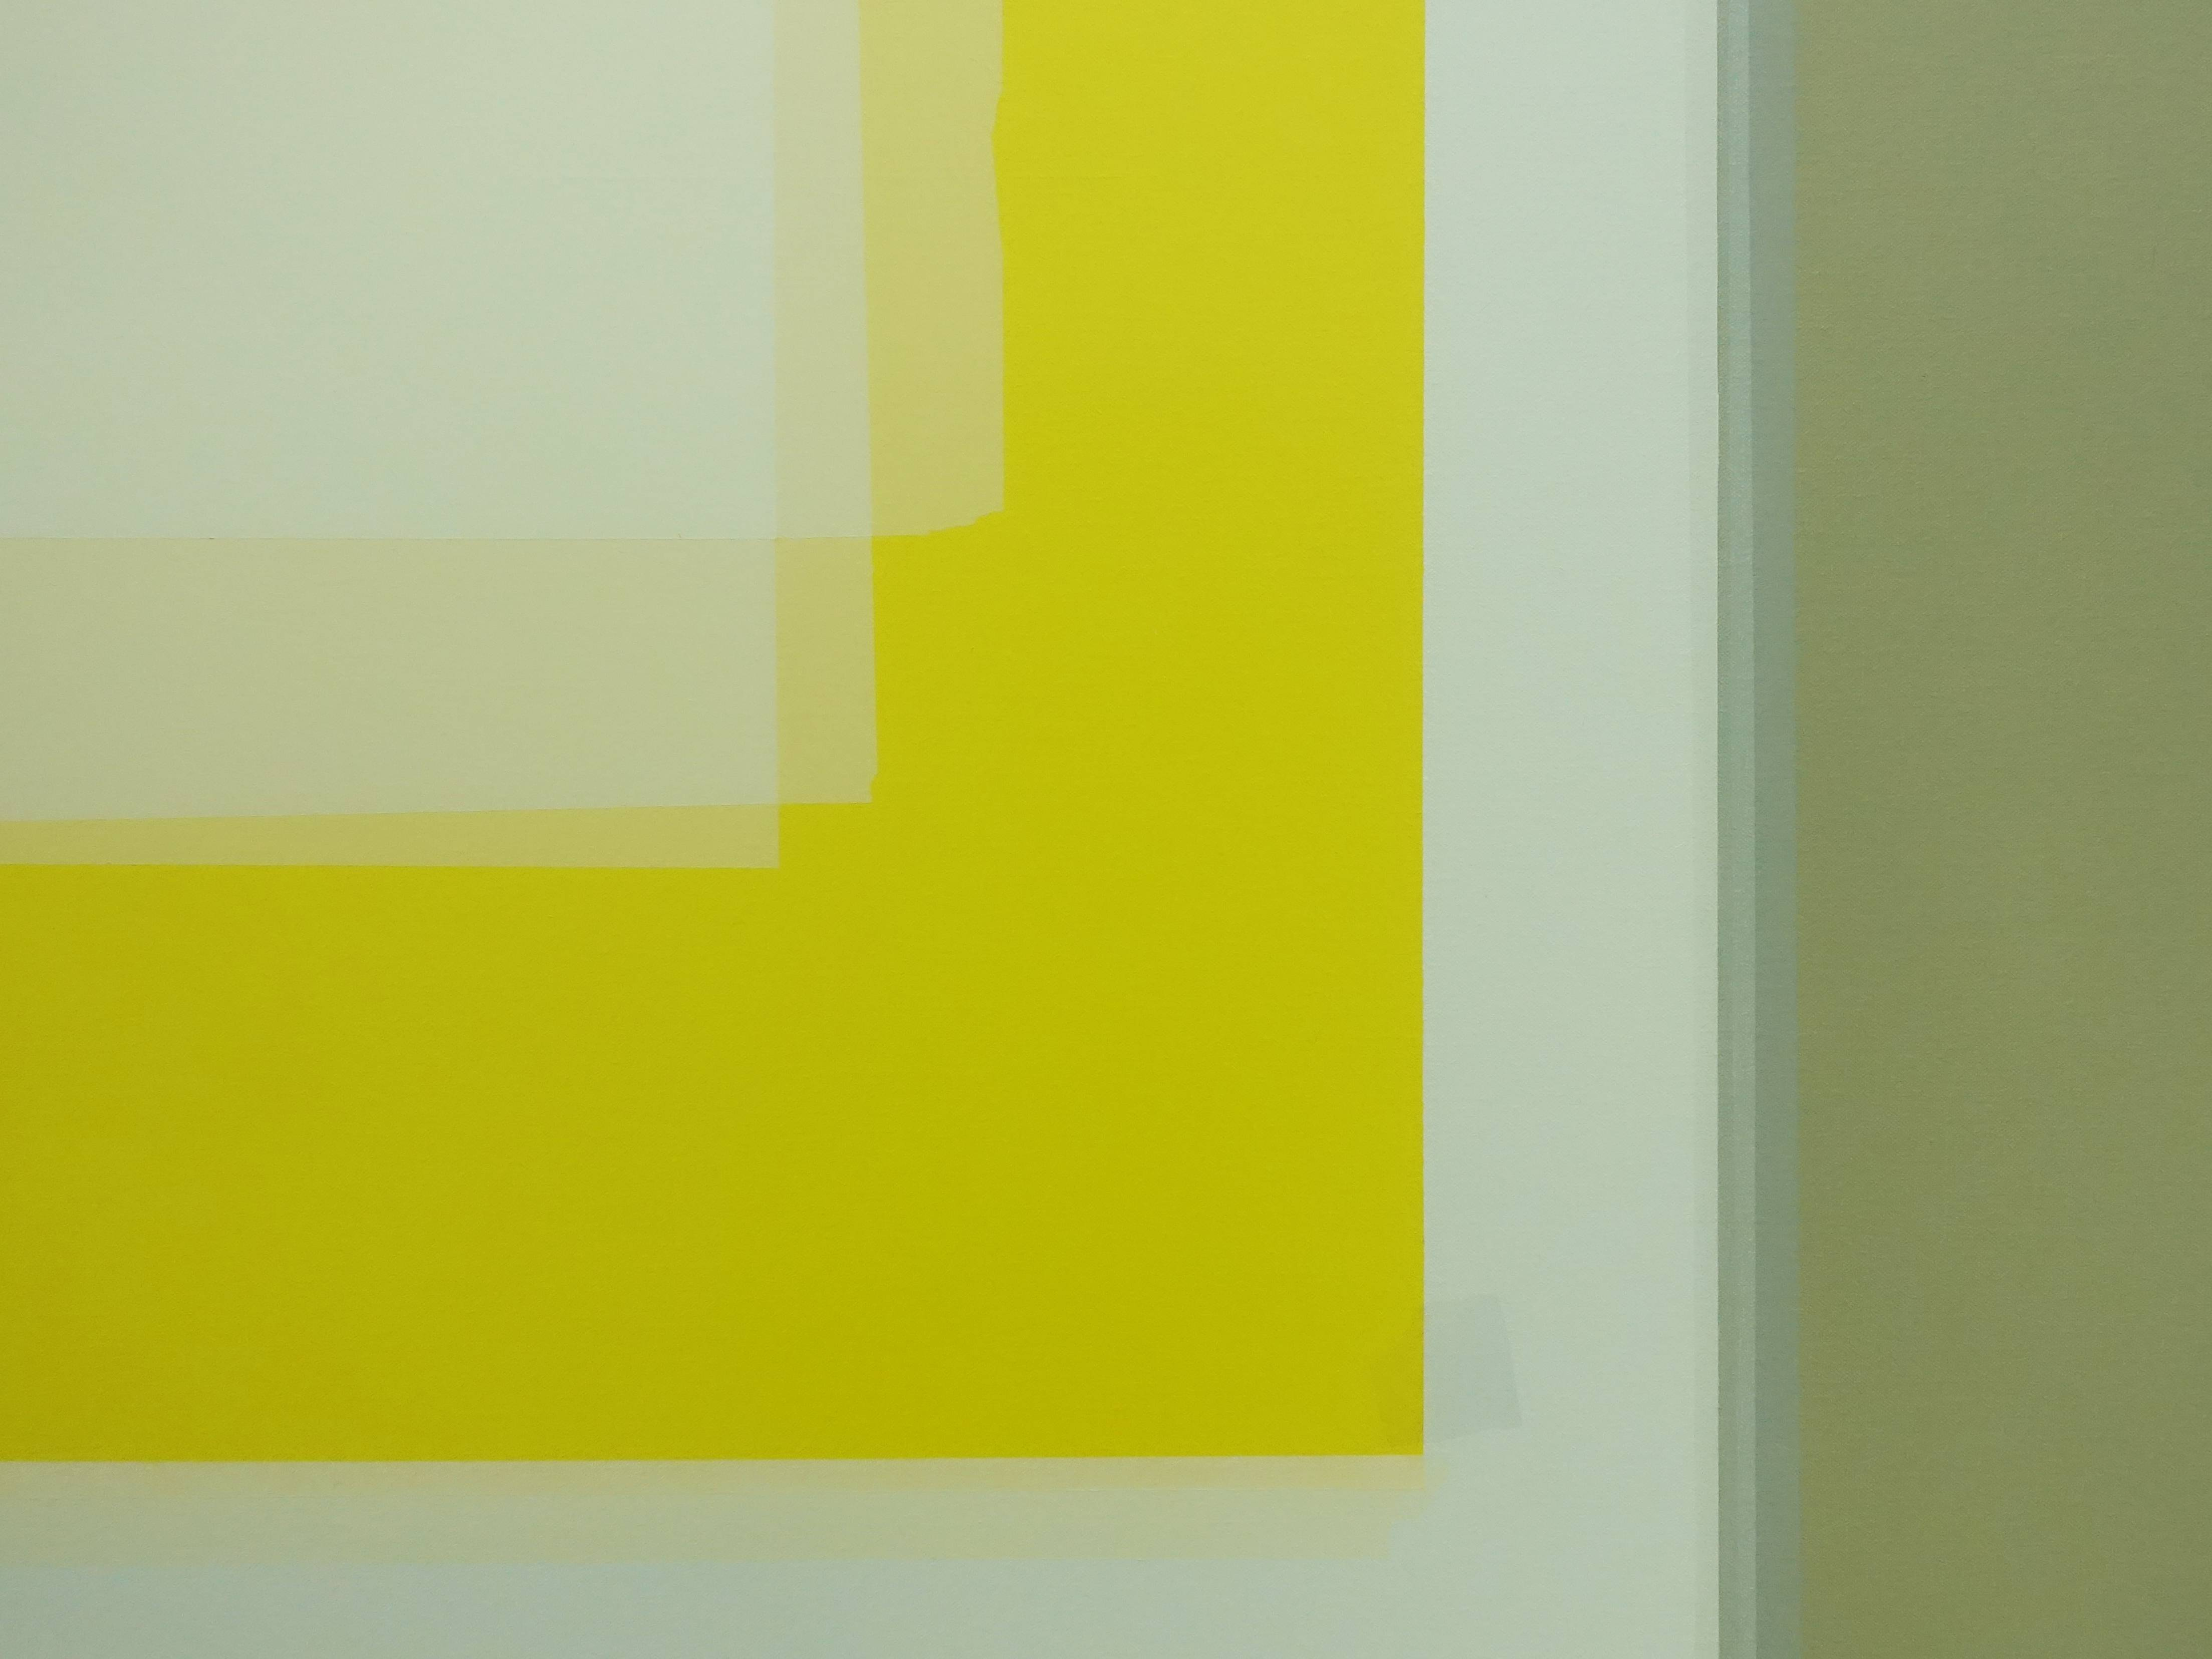 Kees Goudzwaard,《Storage藏》細節,Oil on canvas,120 x 100 cm,2018。